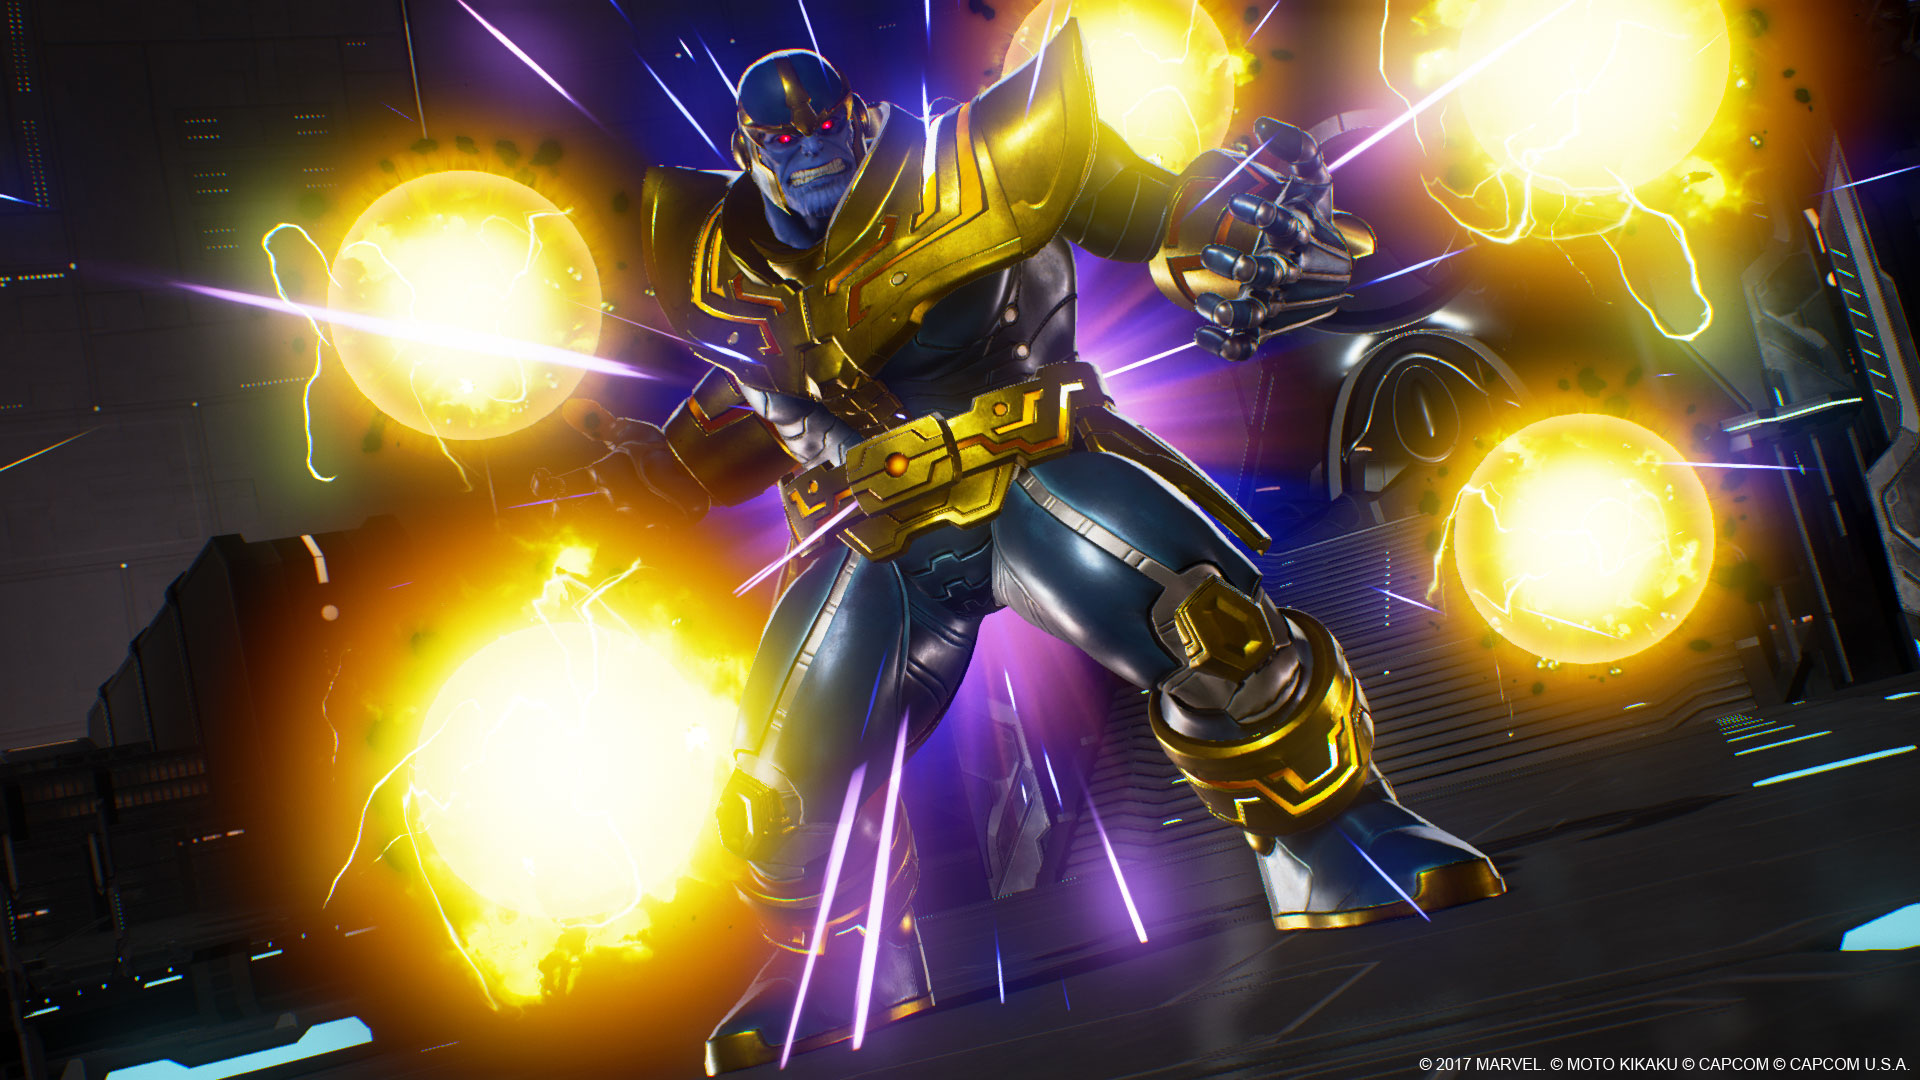 MVCI_1706_Thanos_001.jpg